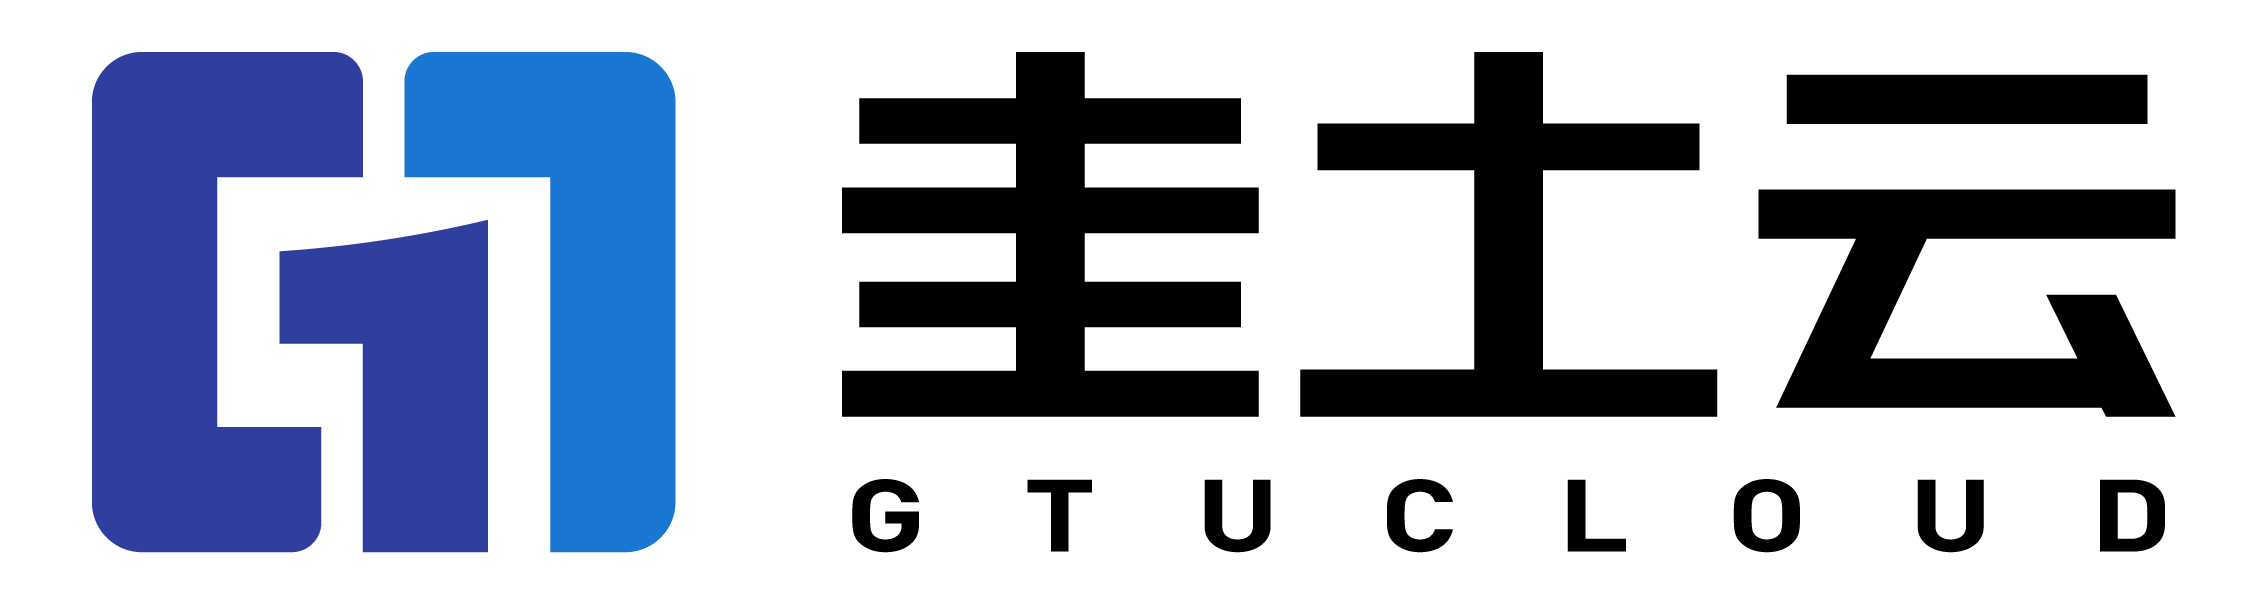 中英文logo